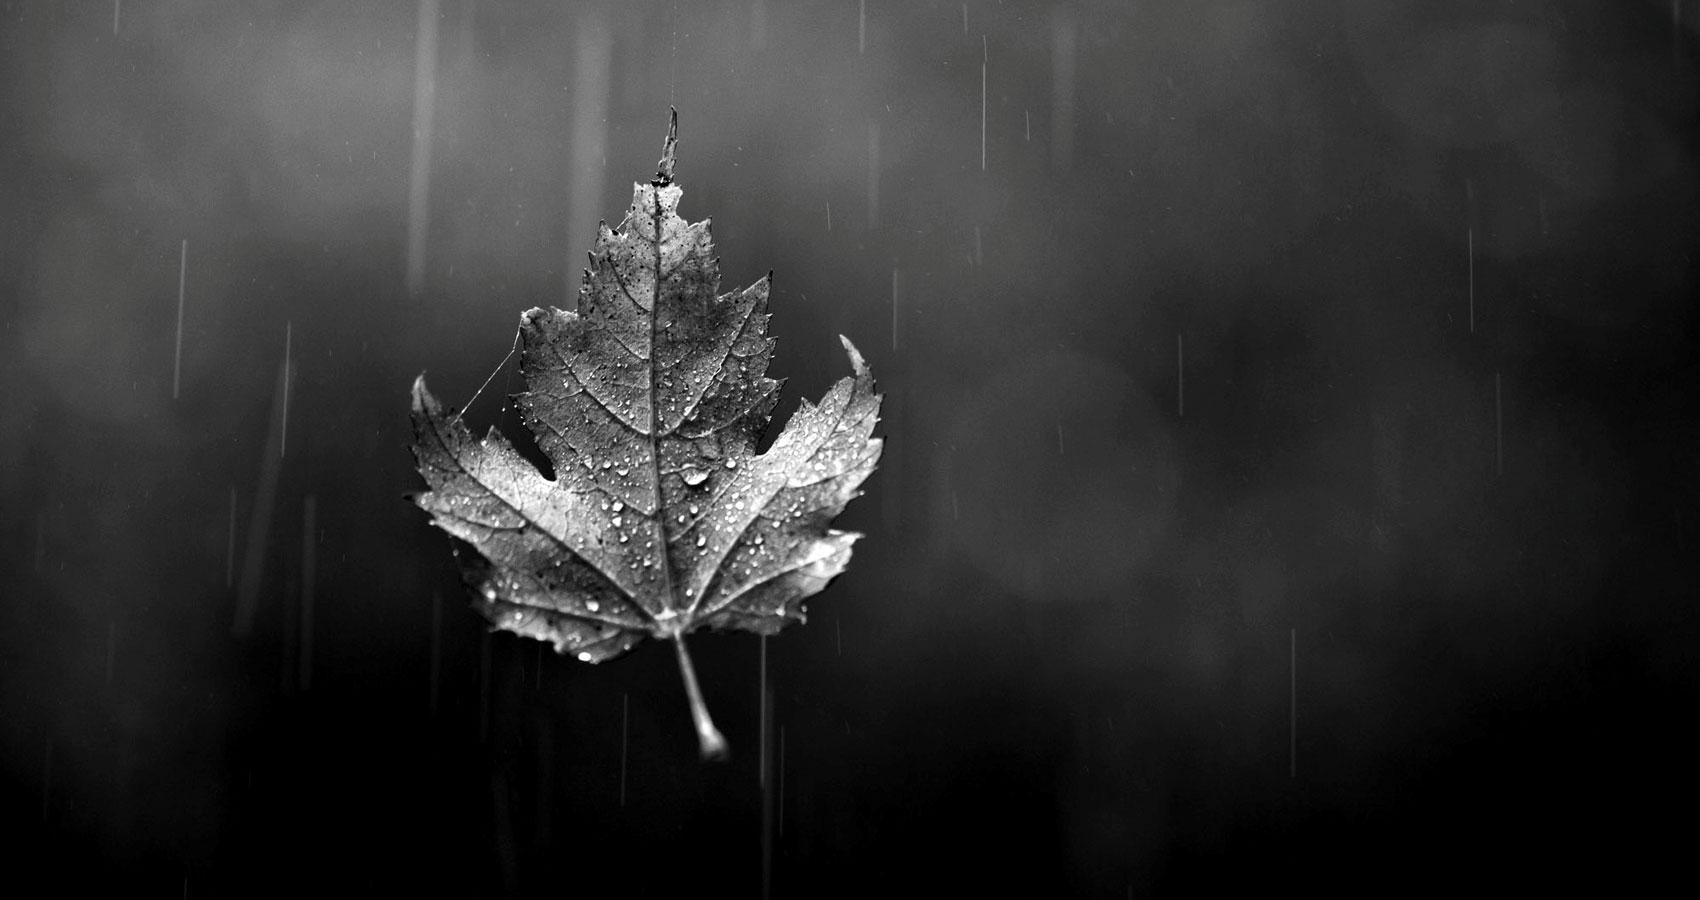 A Leaf Falls written by Pilgrim at Spillwords.com